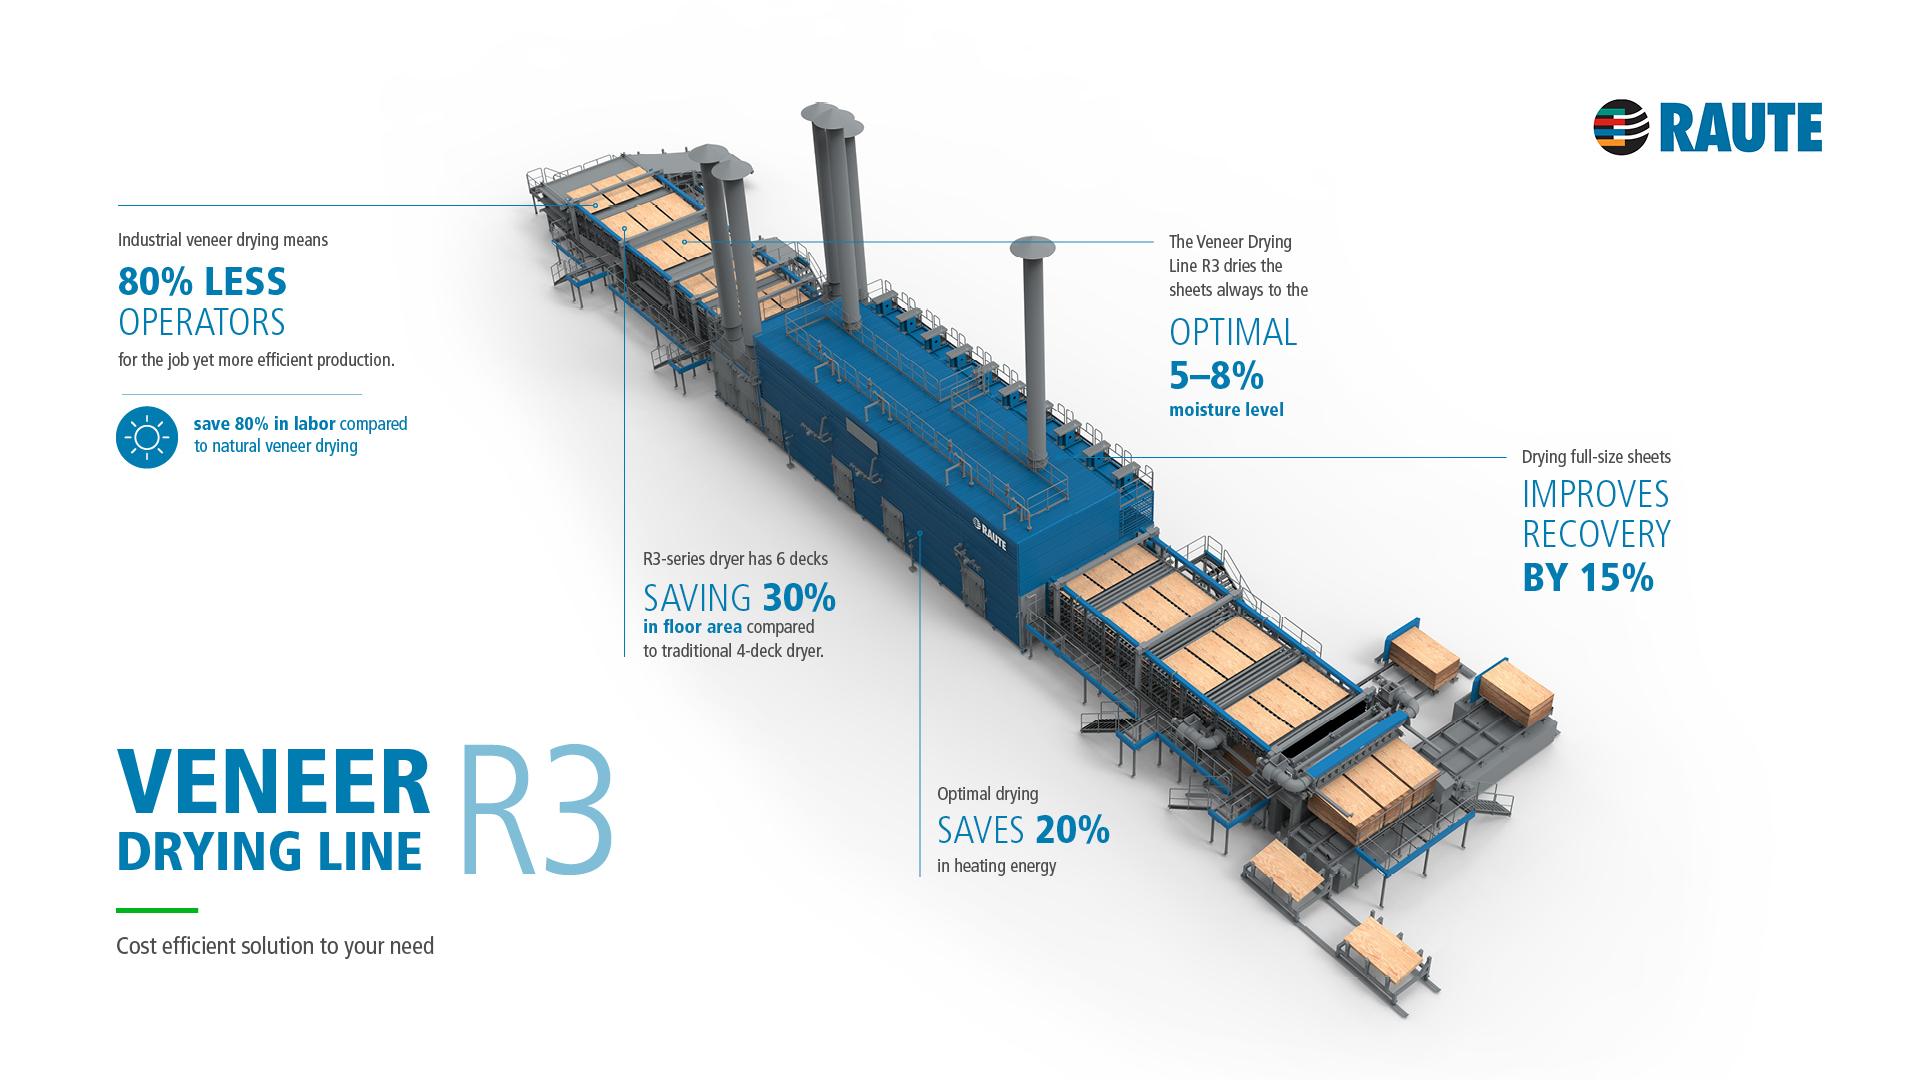 Raute Veneer Drying Line R3 infographic Avidly